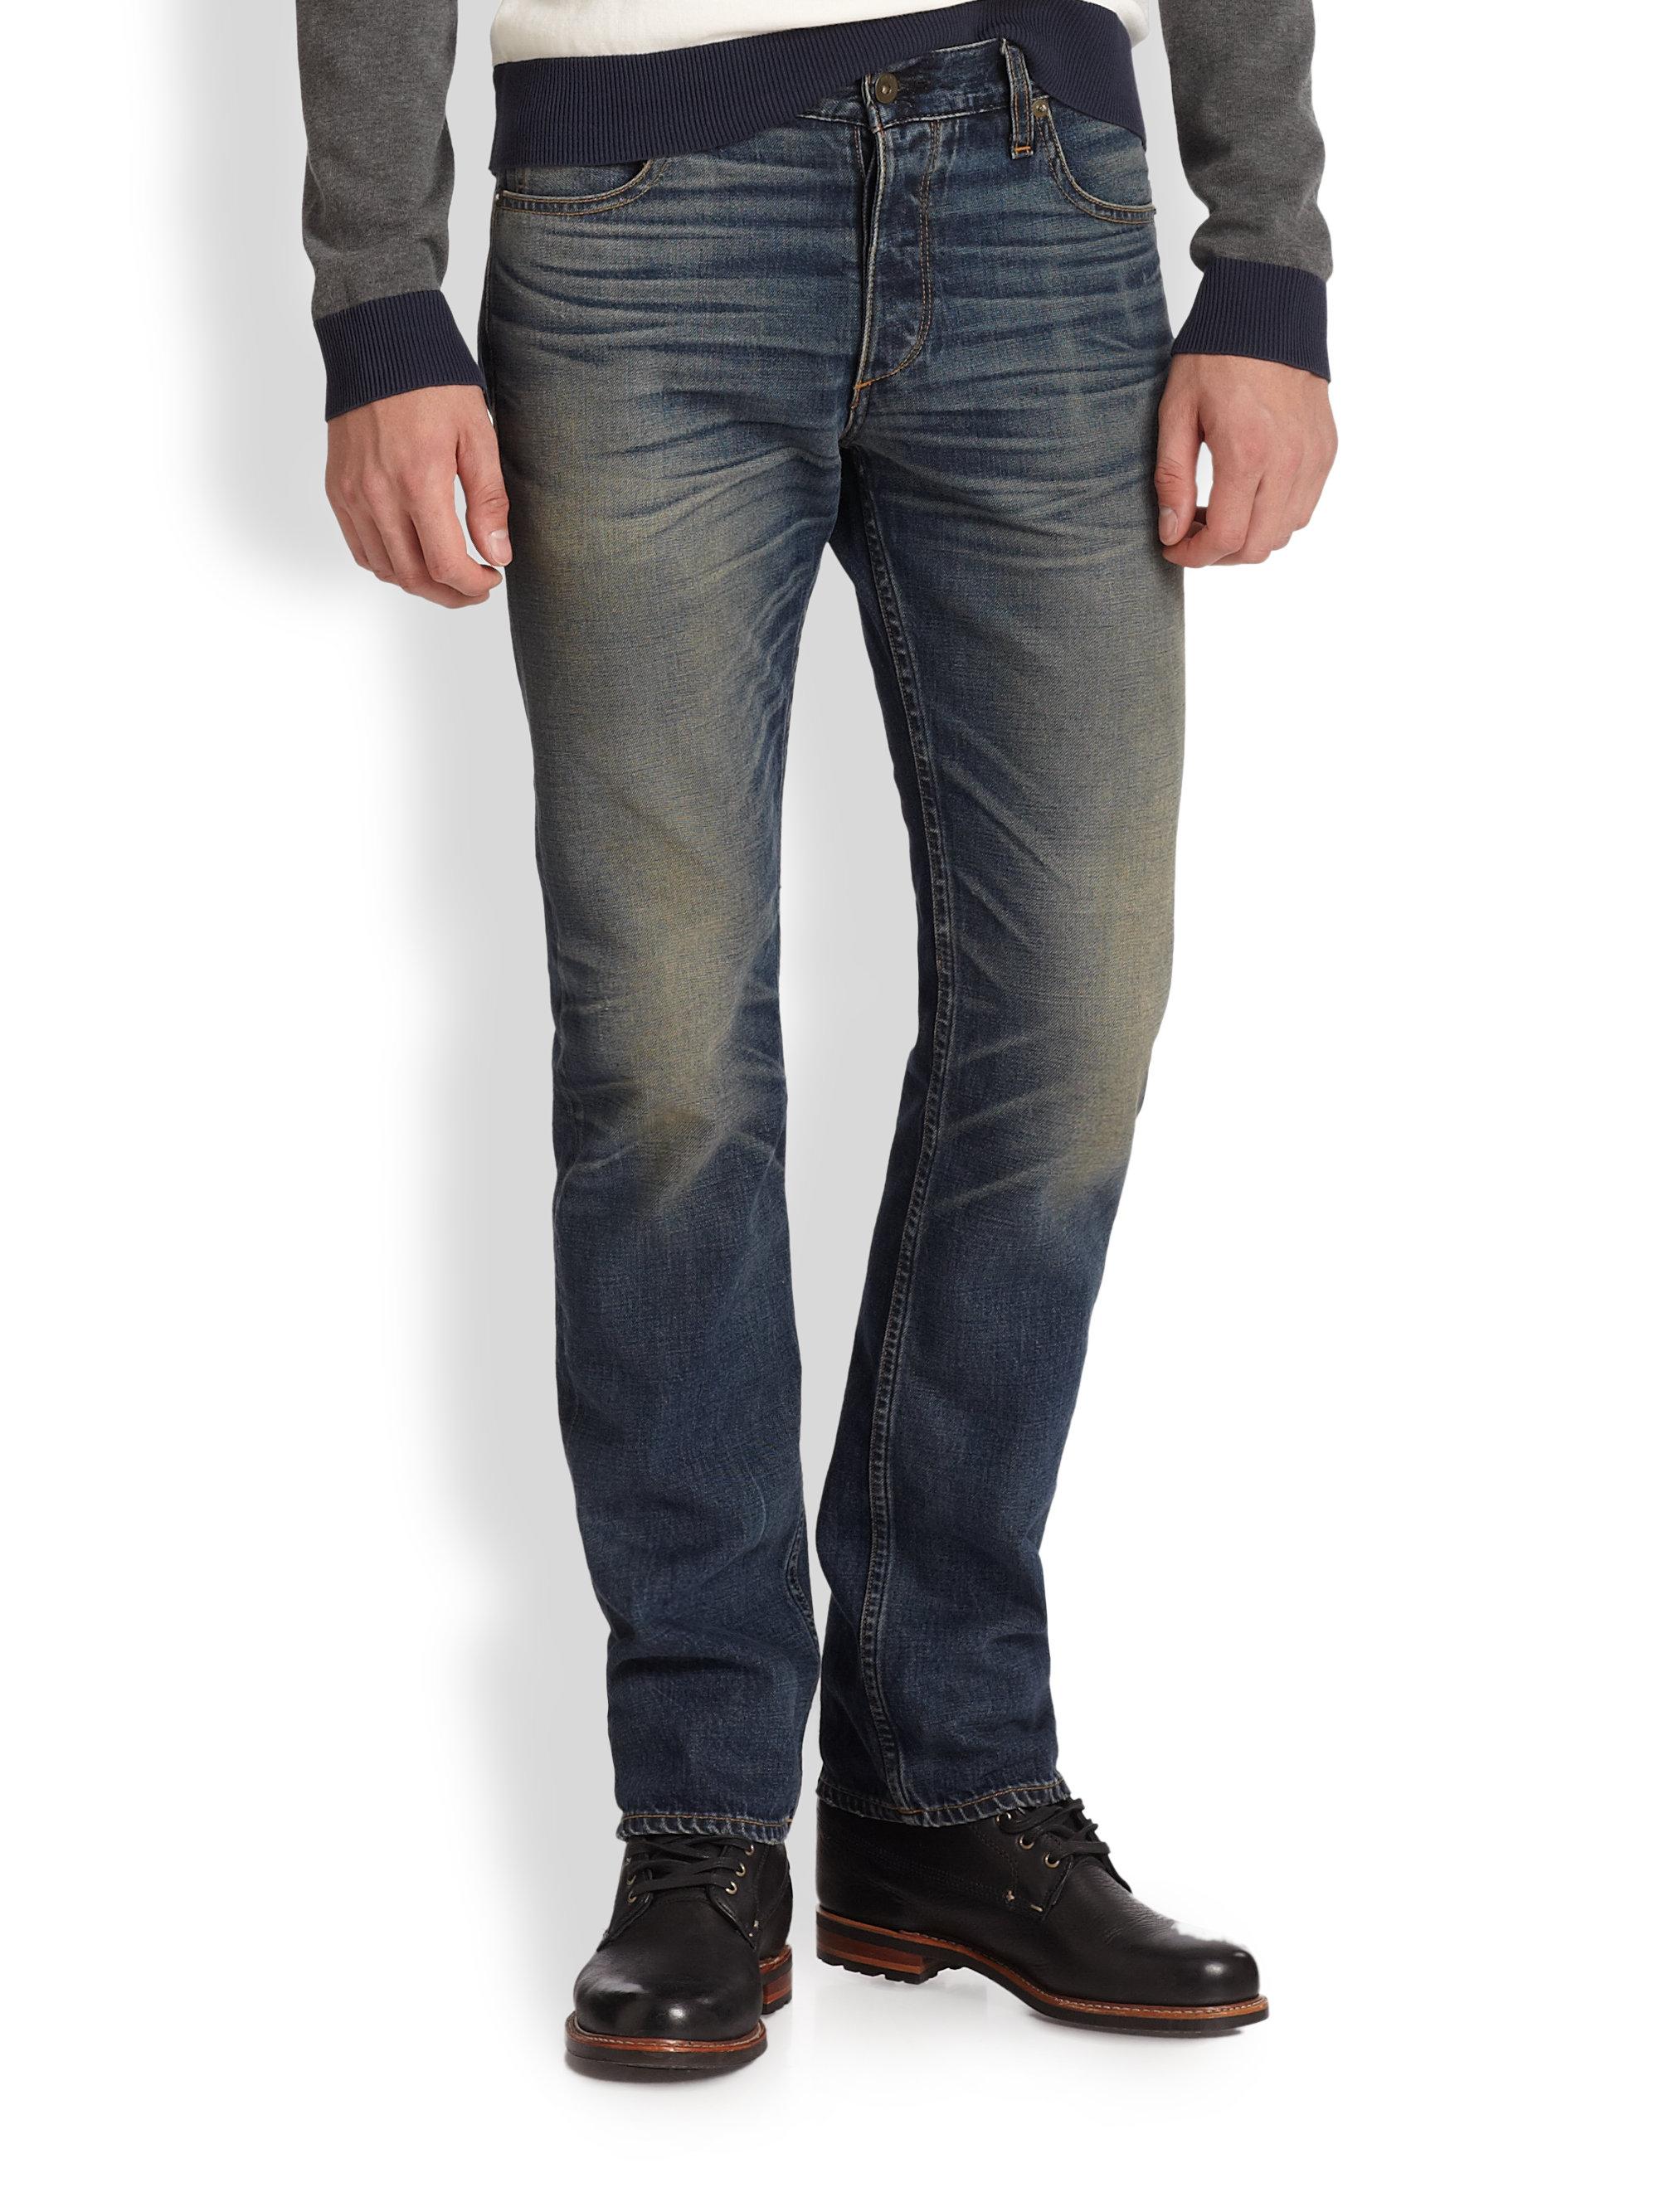 Rag Bone Rb15x Slim Jeans In Blue For Men Lyst